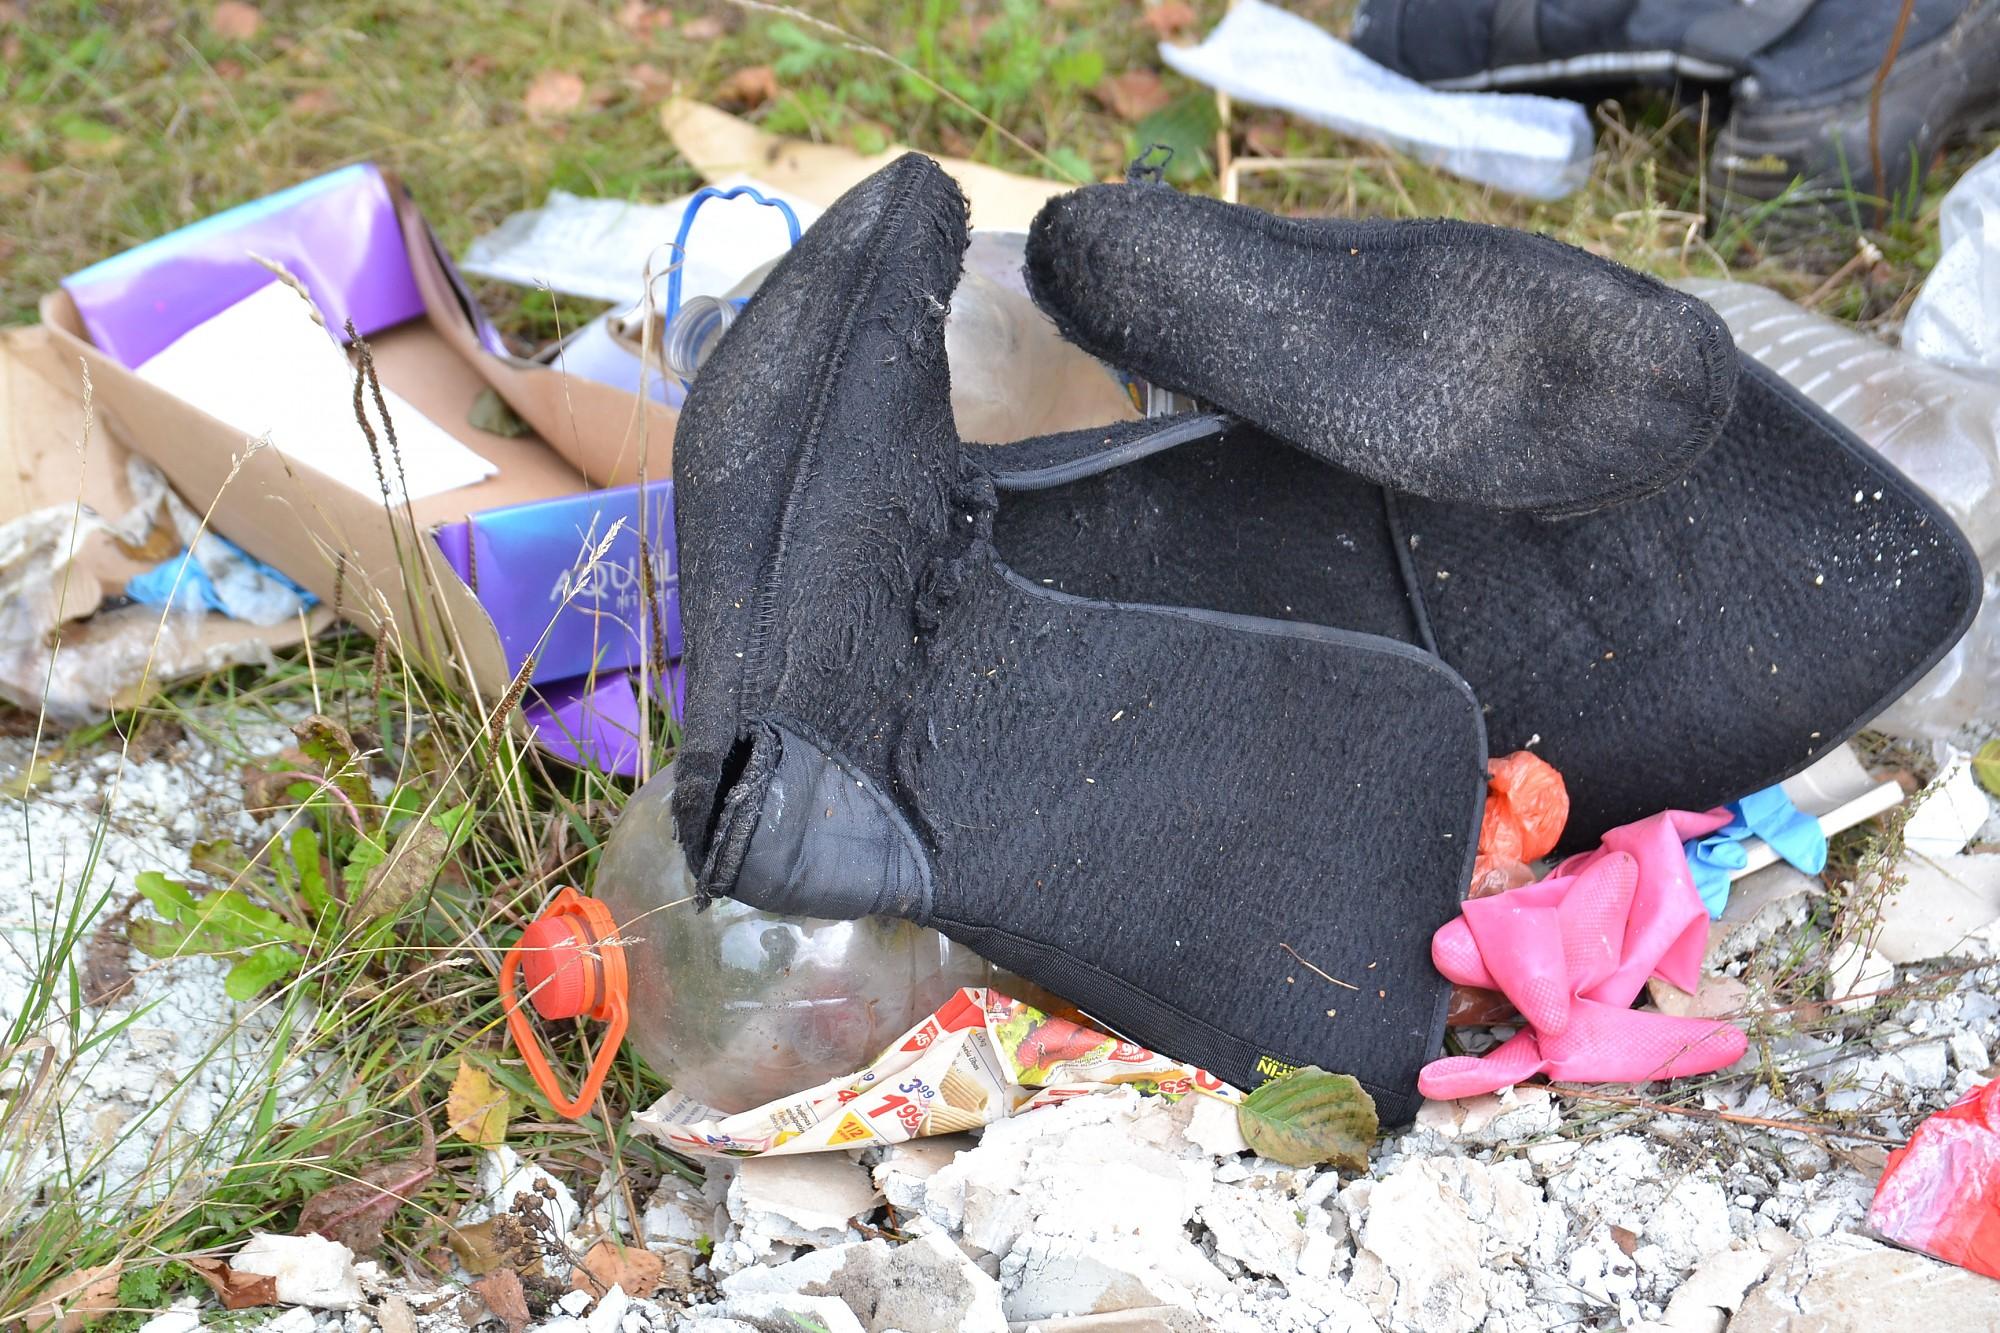 Deguši atkritumi